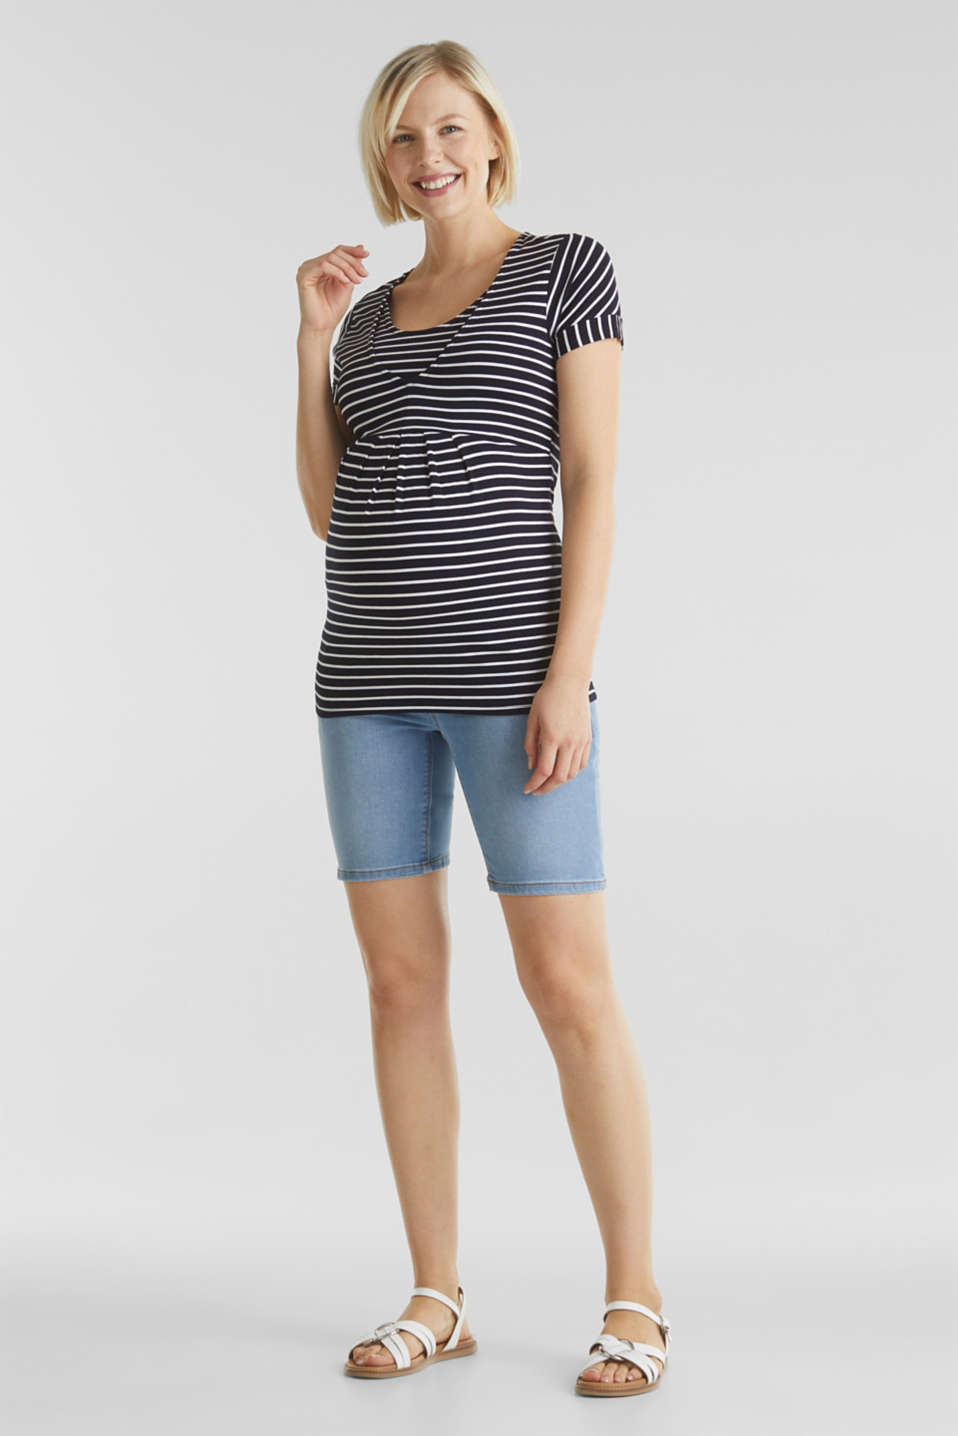 Denim shorts with an under-bump waistband, LCLIGHTWASH, detail image number 1